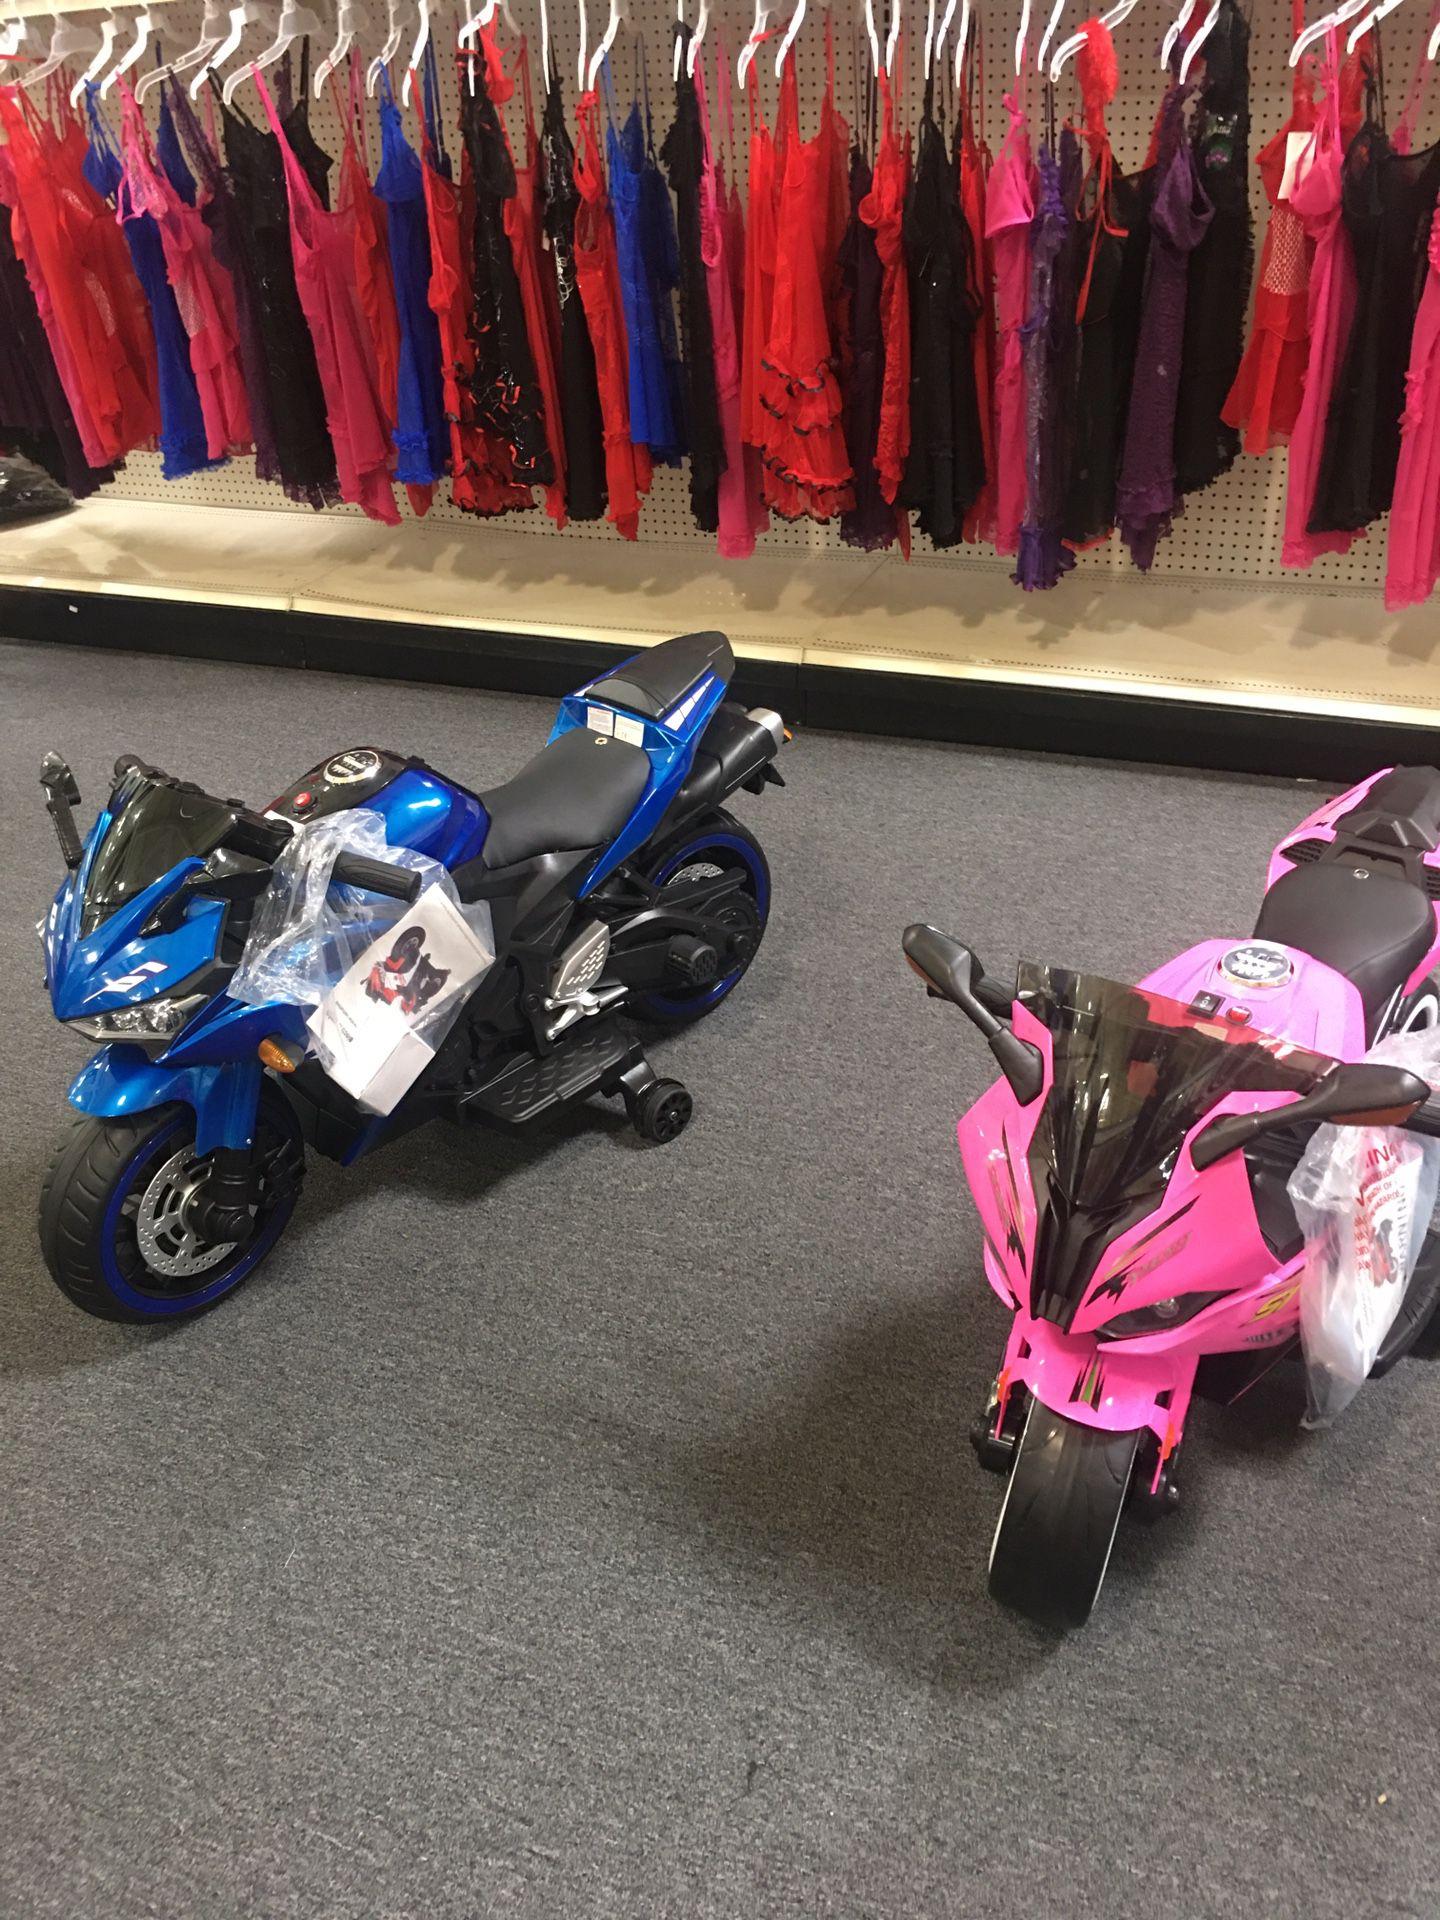 Kids Bike 12 volt Chargeable